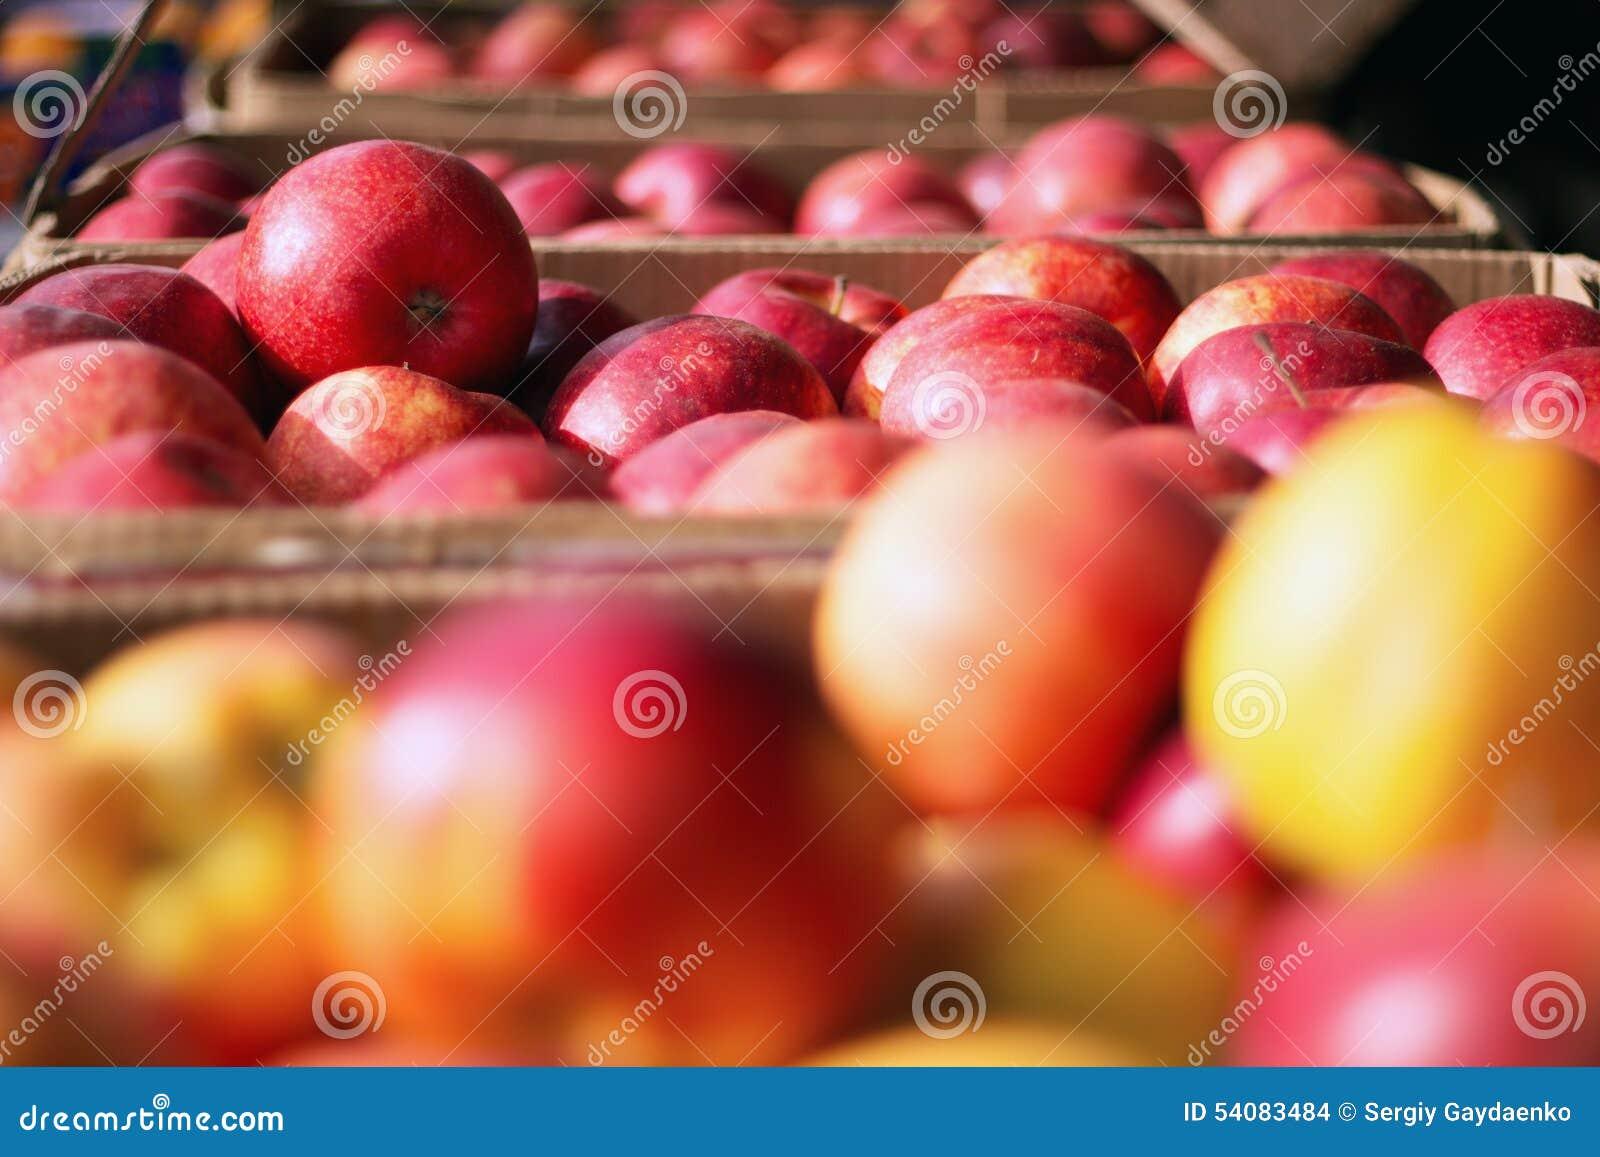 Appelen in kratten op markt